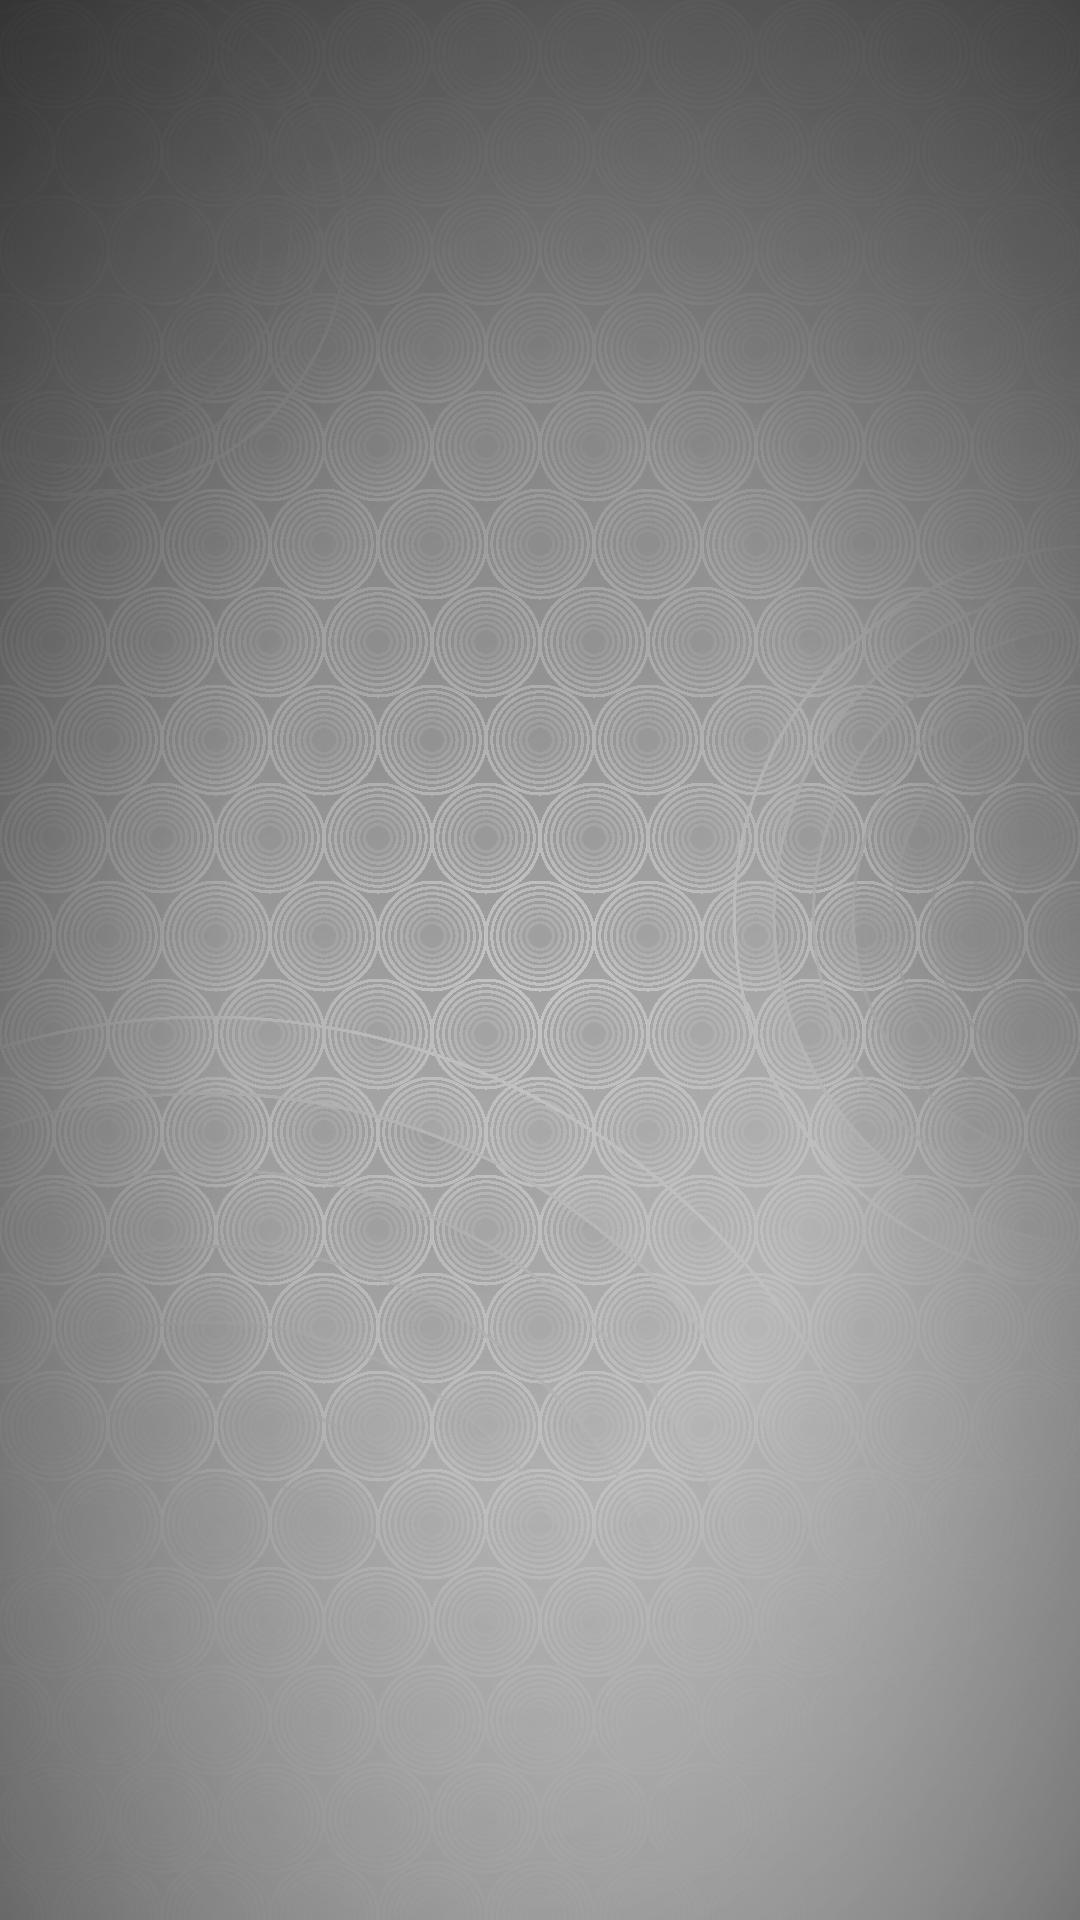 SmartPhone FullHD Fondo de pantalla